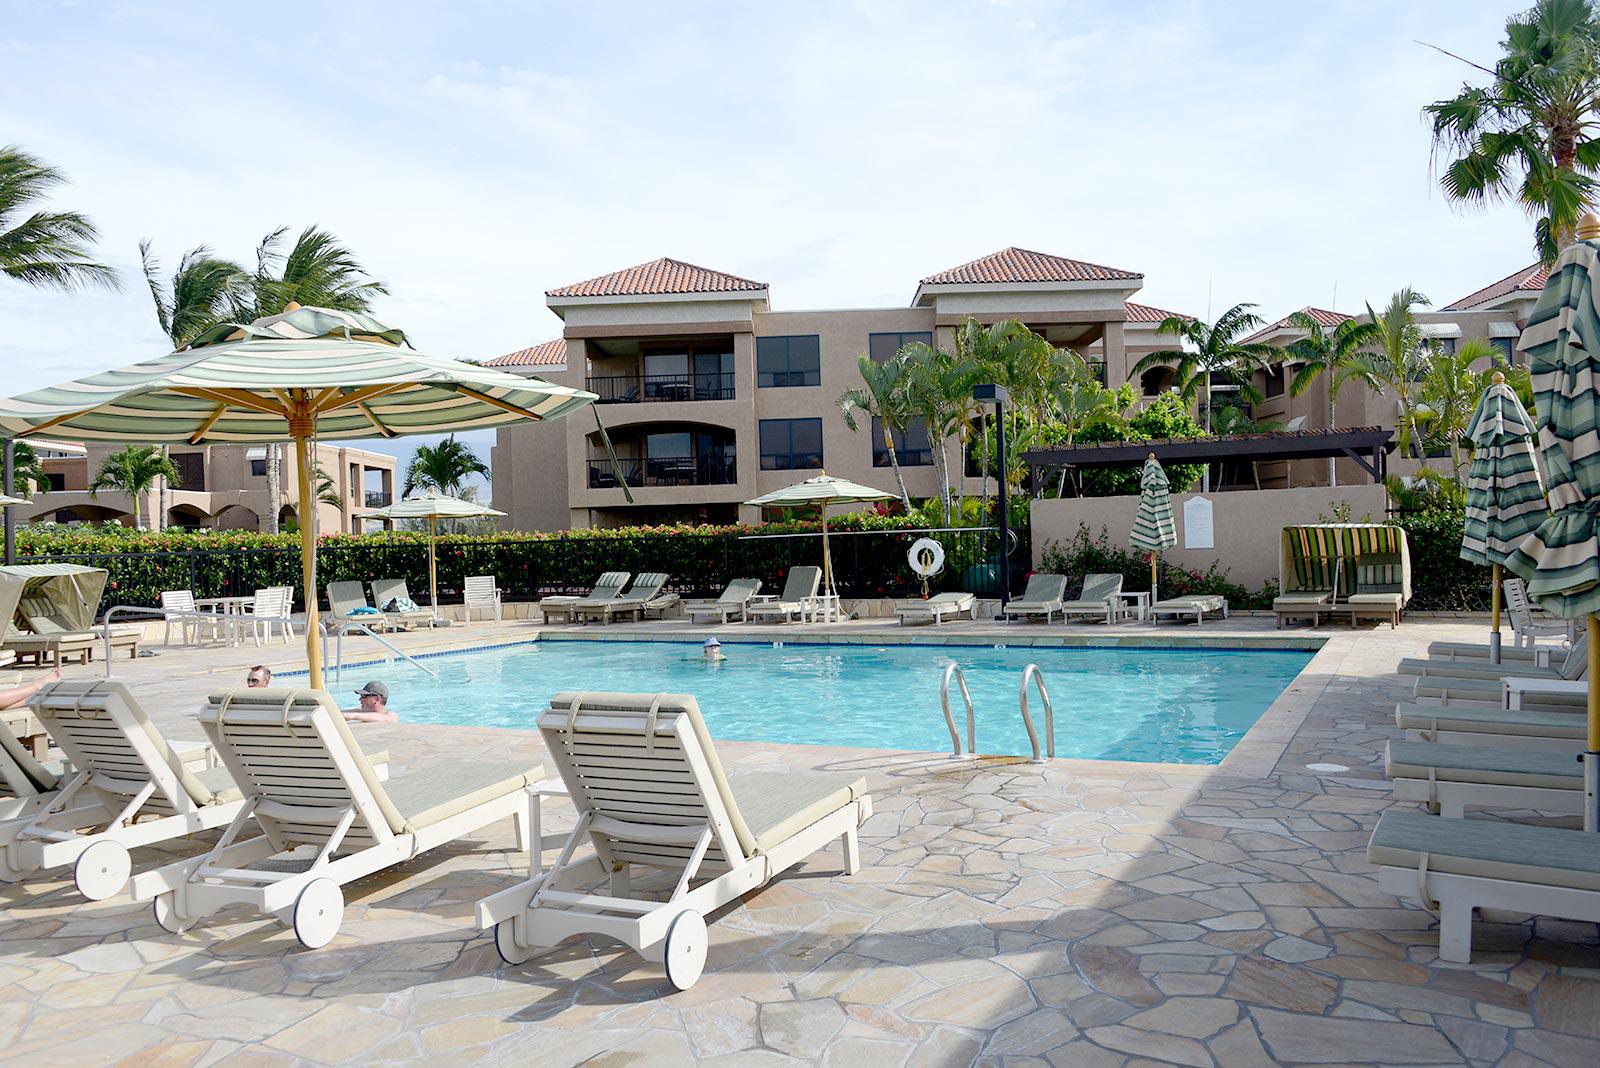 Hilton Grand Vacation Club at Waikoloa Beach Resort